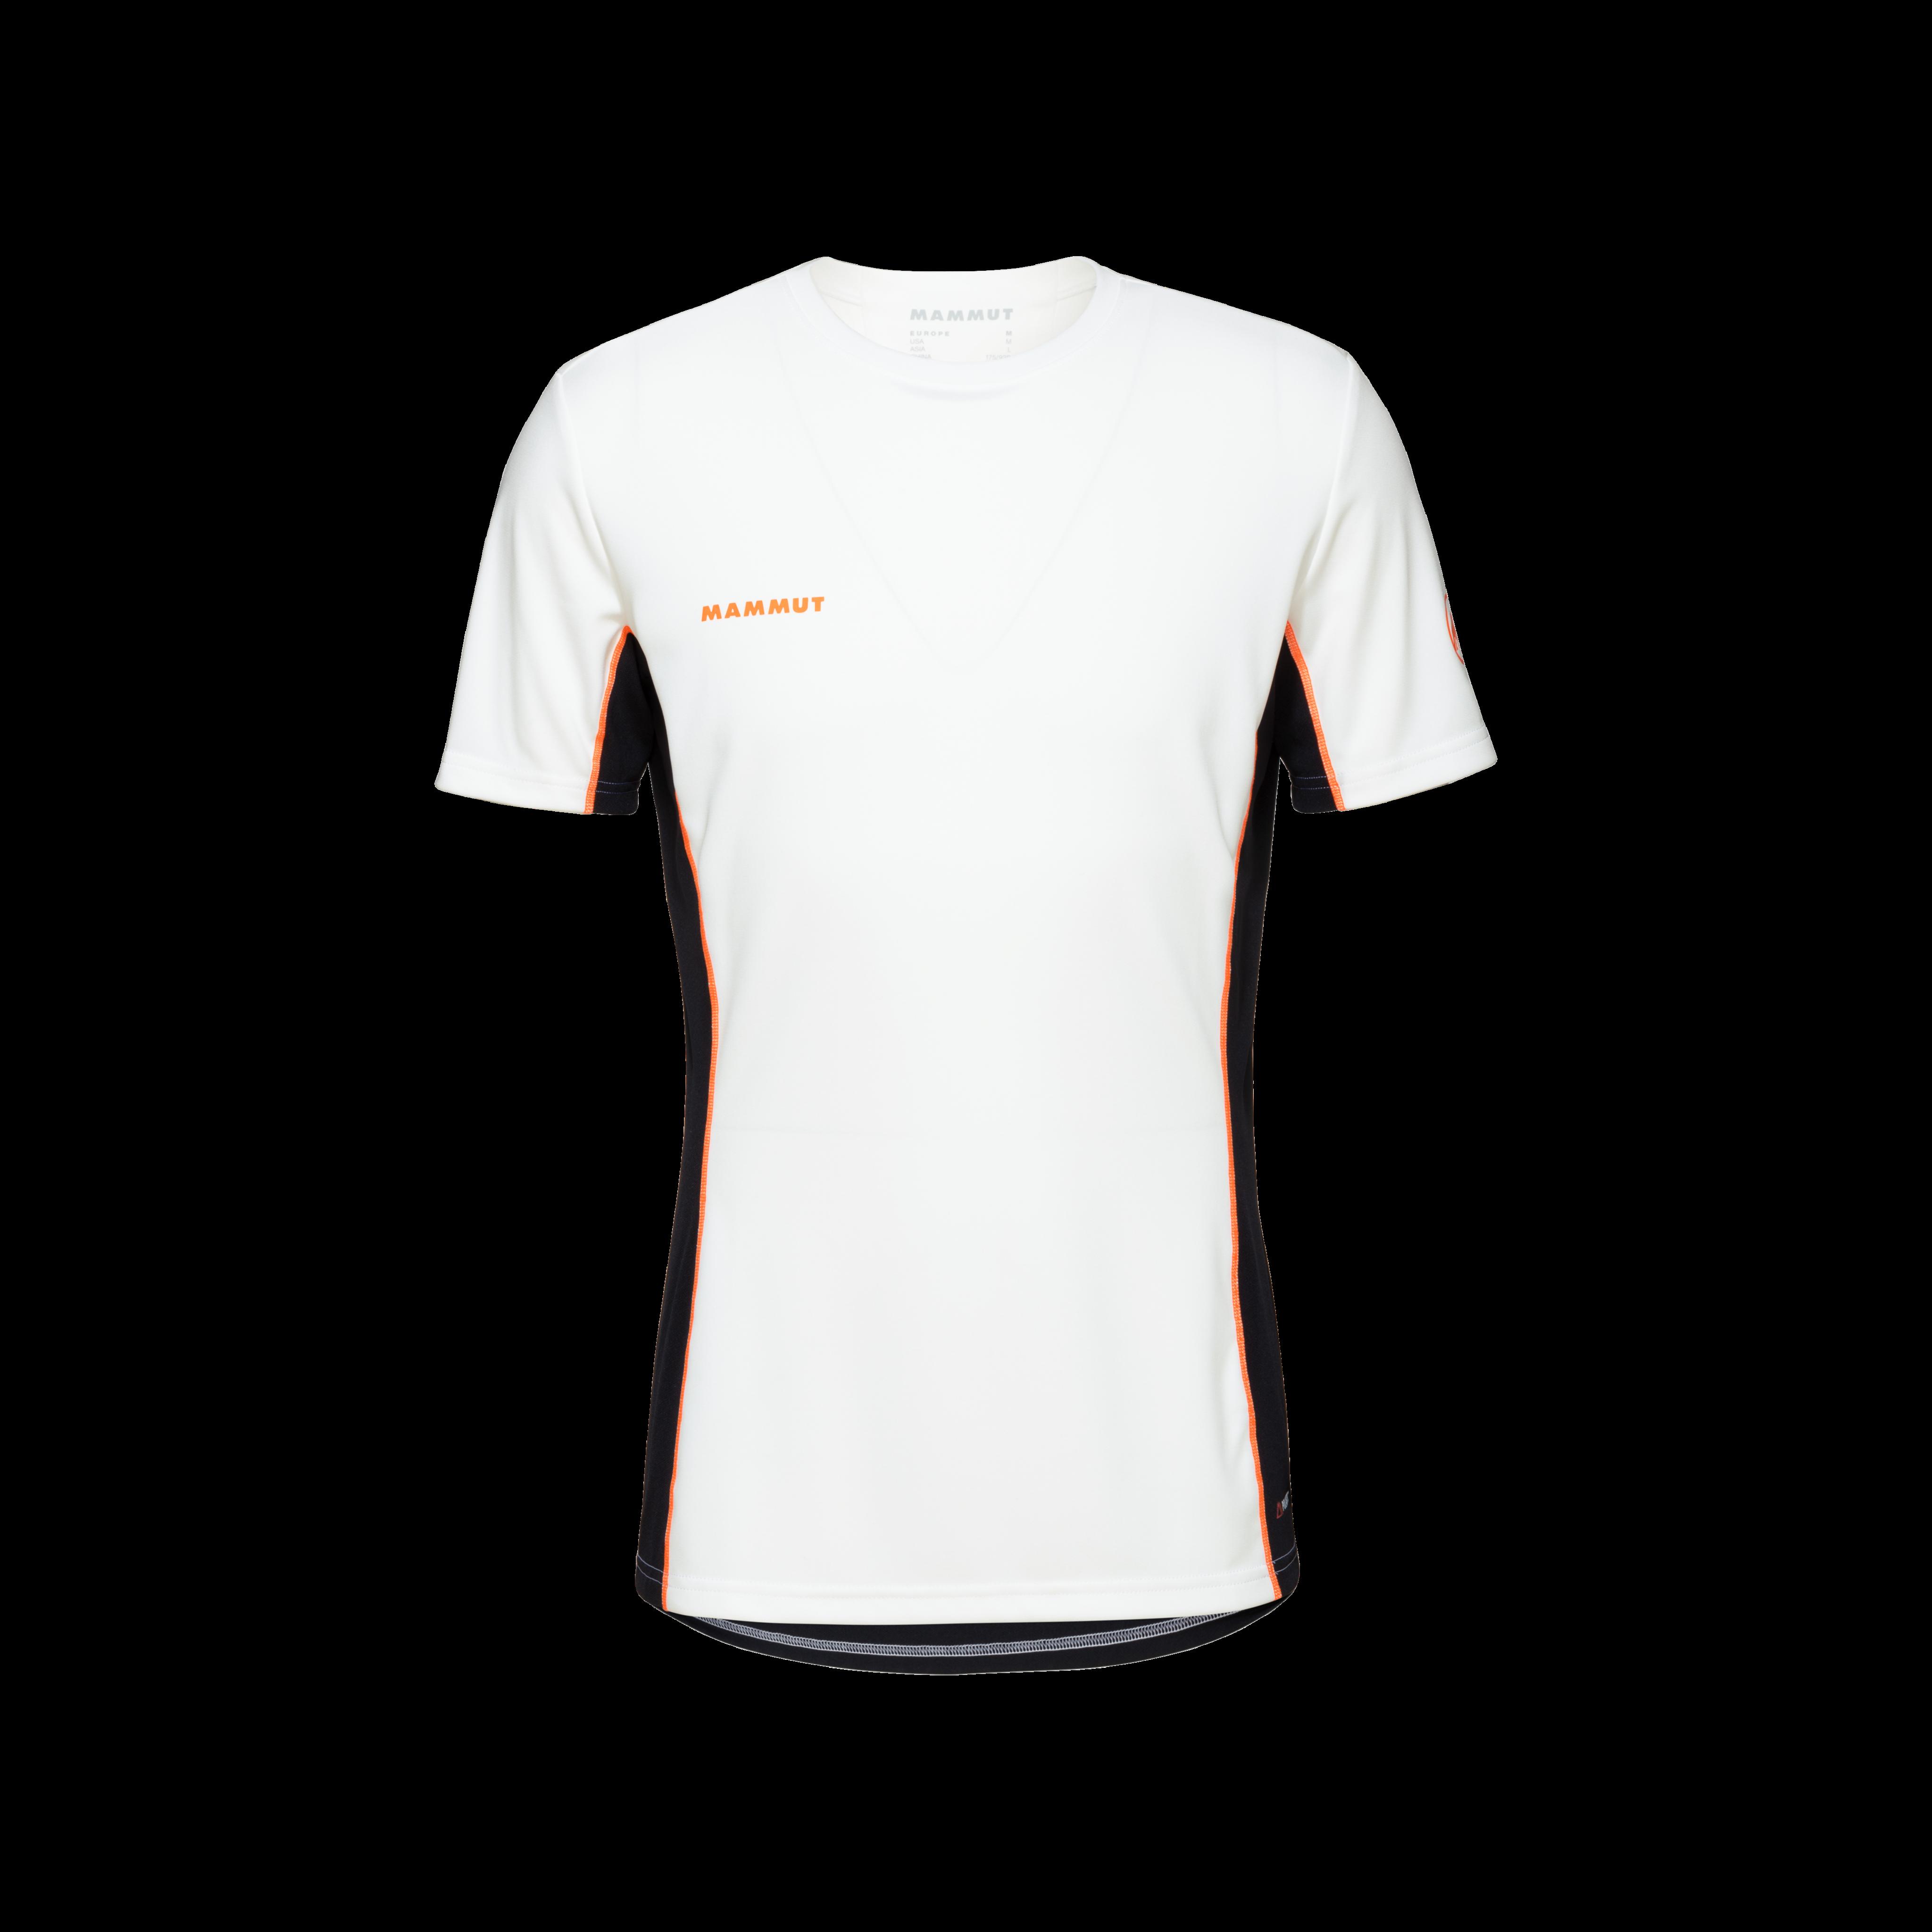 Sertig T-Shirt Men - white-black-vibrant orange, XXL thumbnail